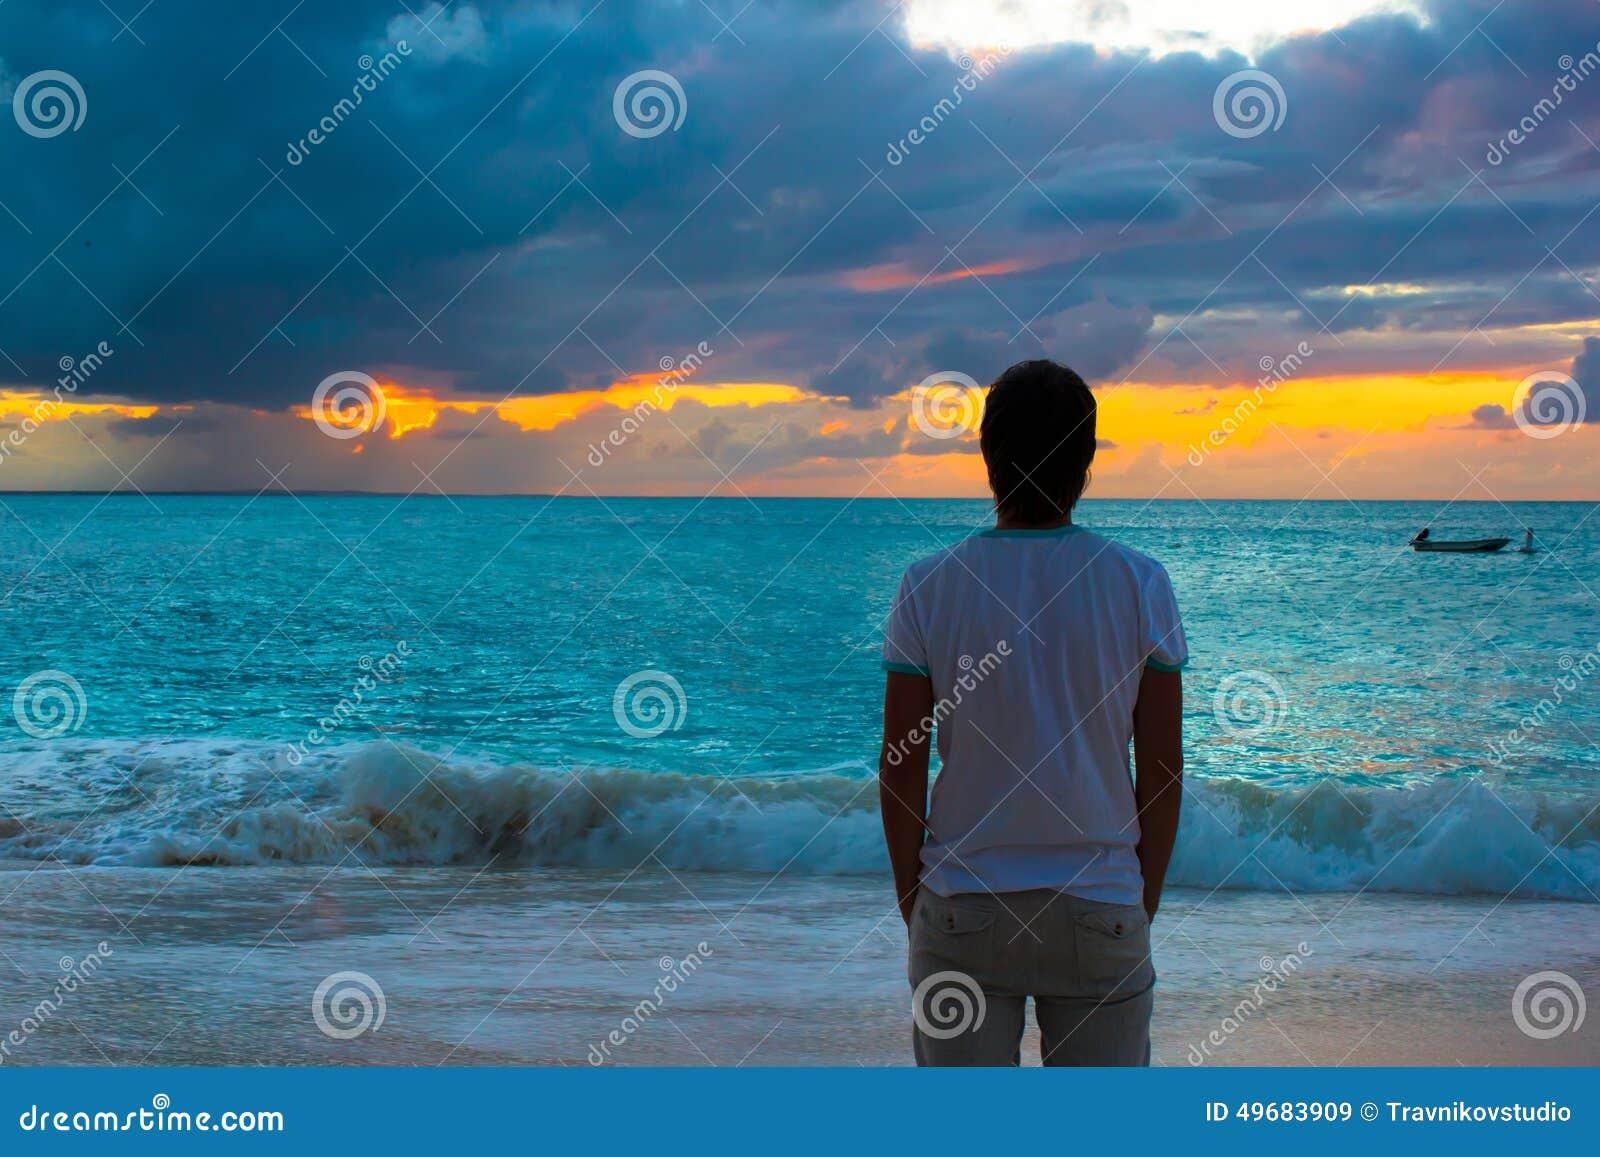 Young Man Enjoying Sunset During Beach Vacation Stock Image - Image ... eb411943100